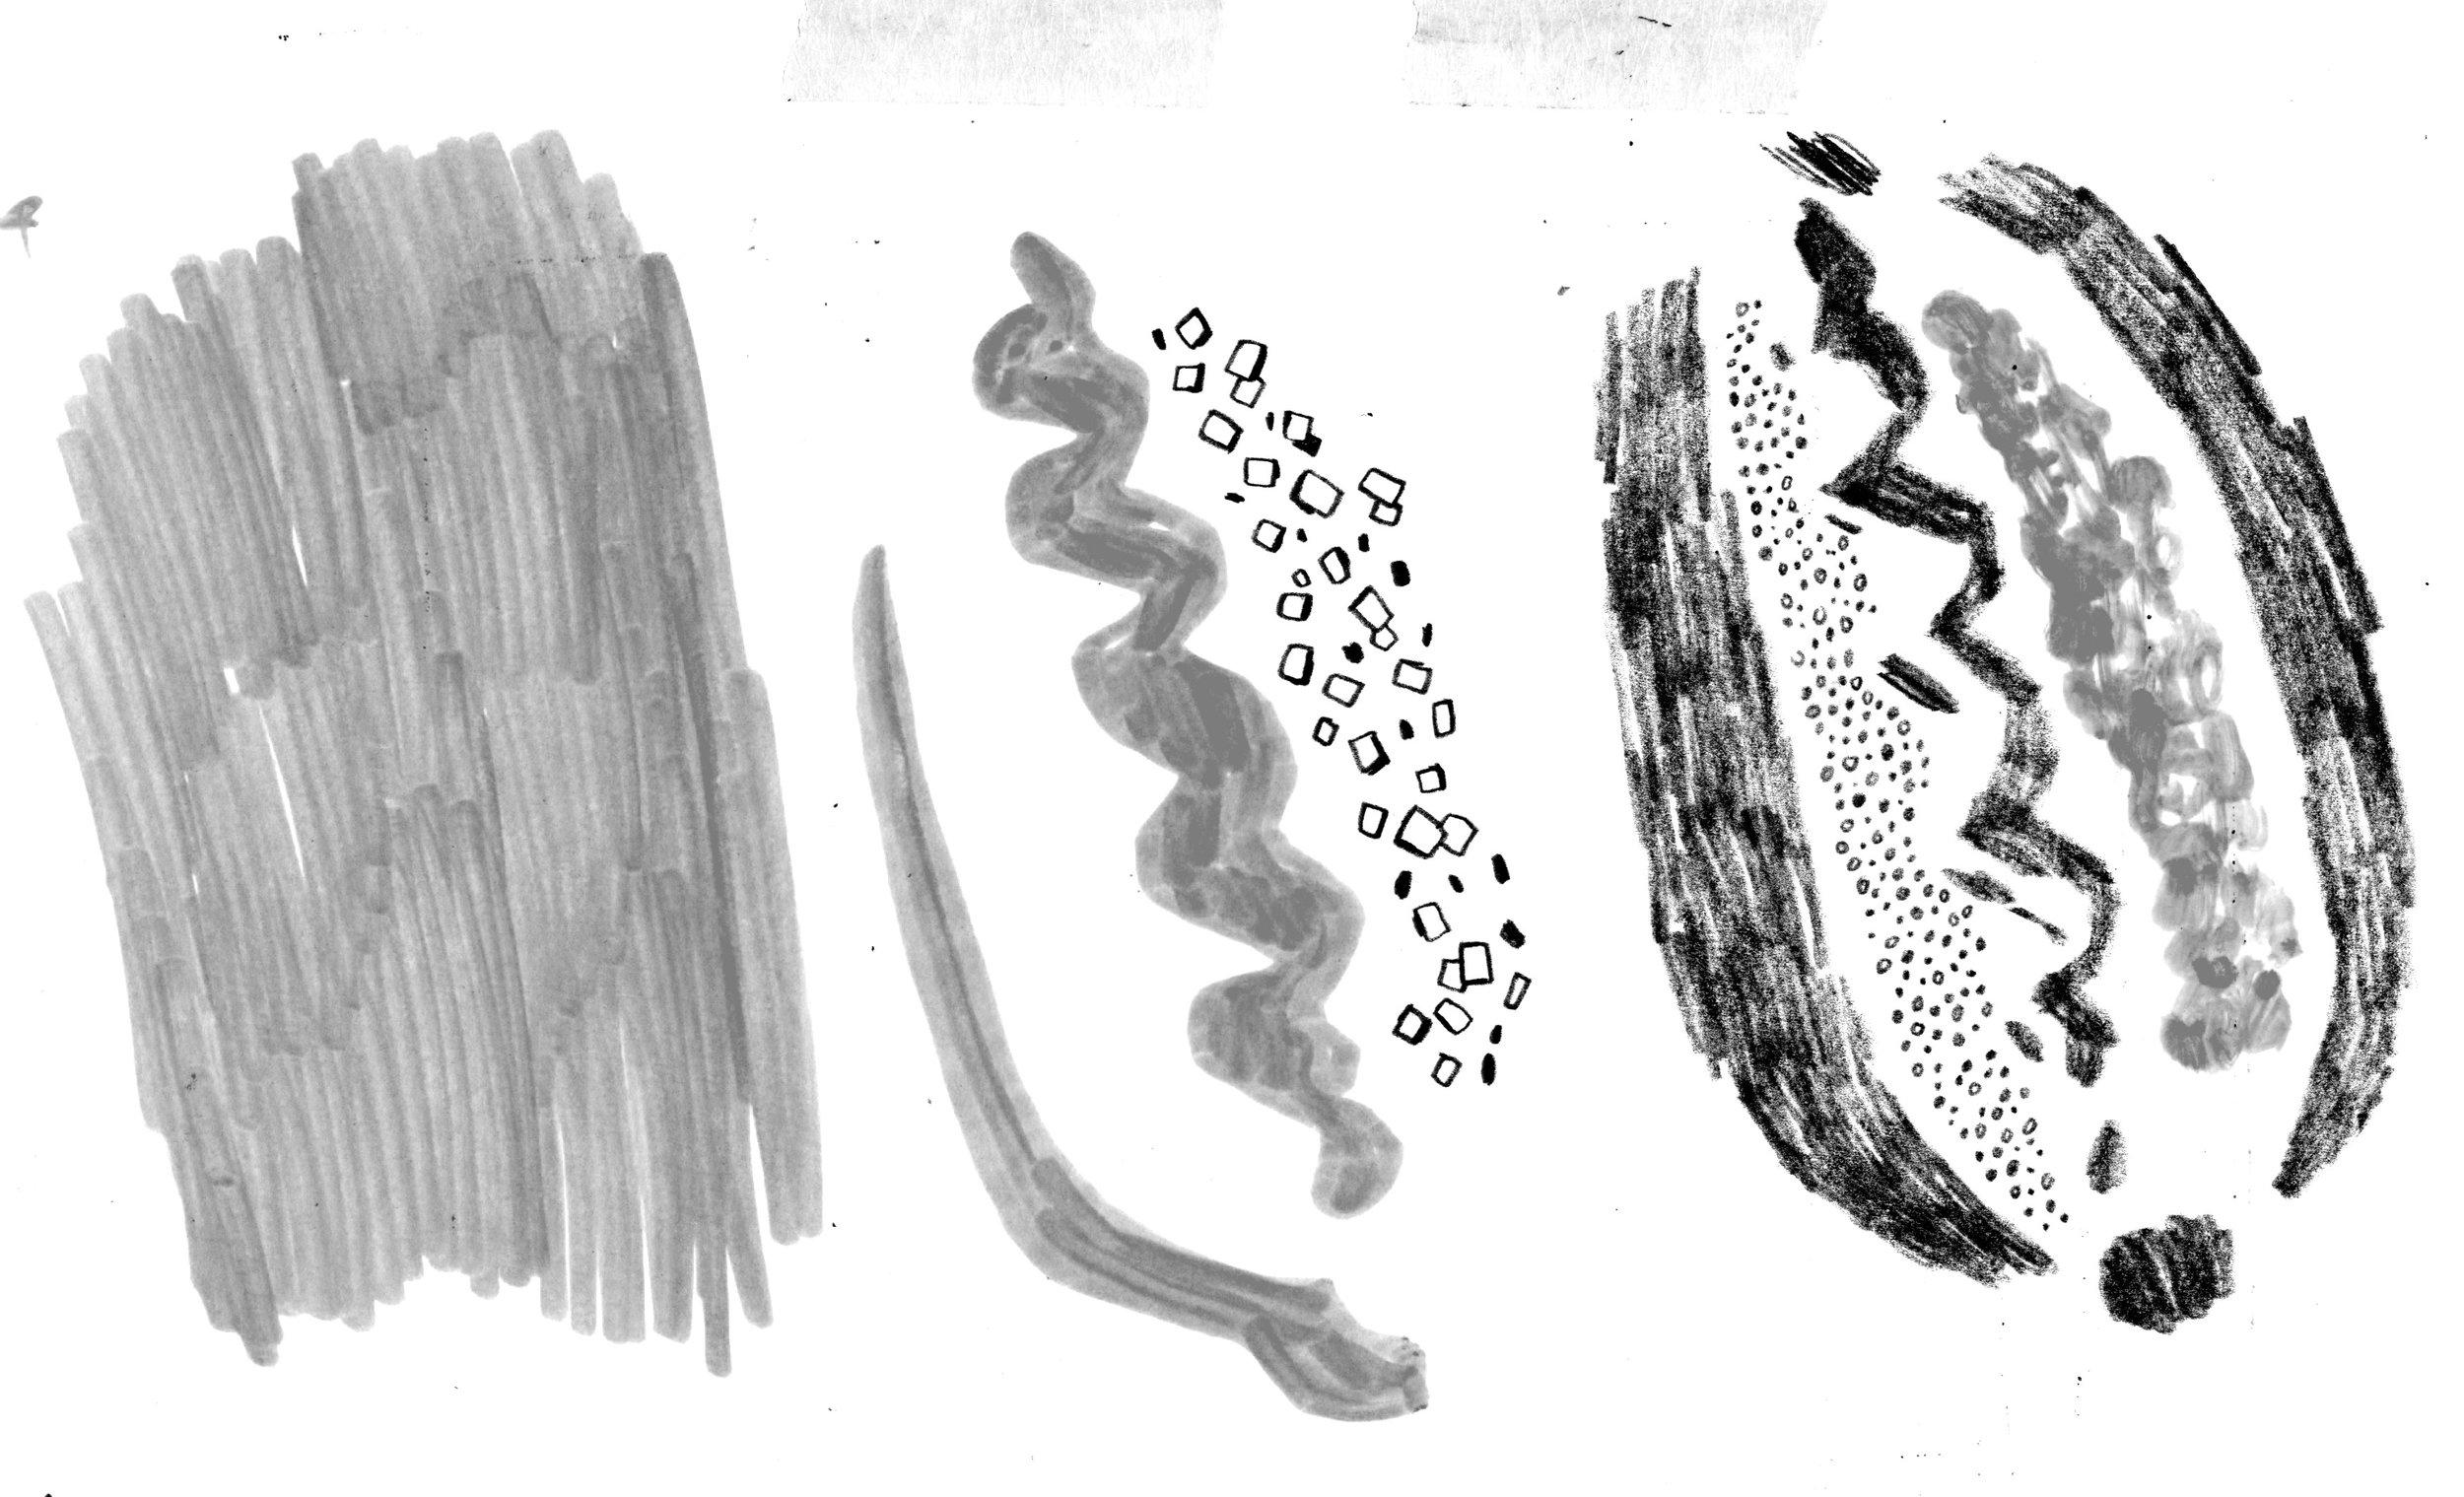 Drew Bardna - Hot Dog Textures